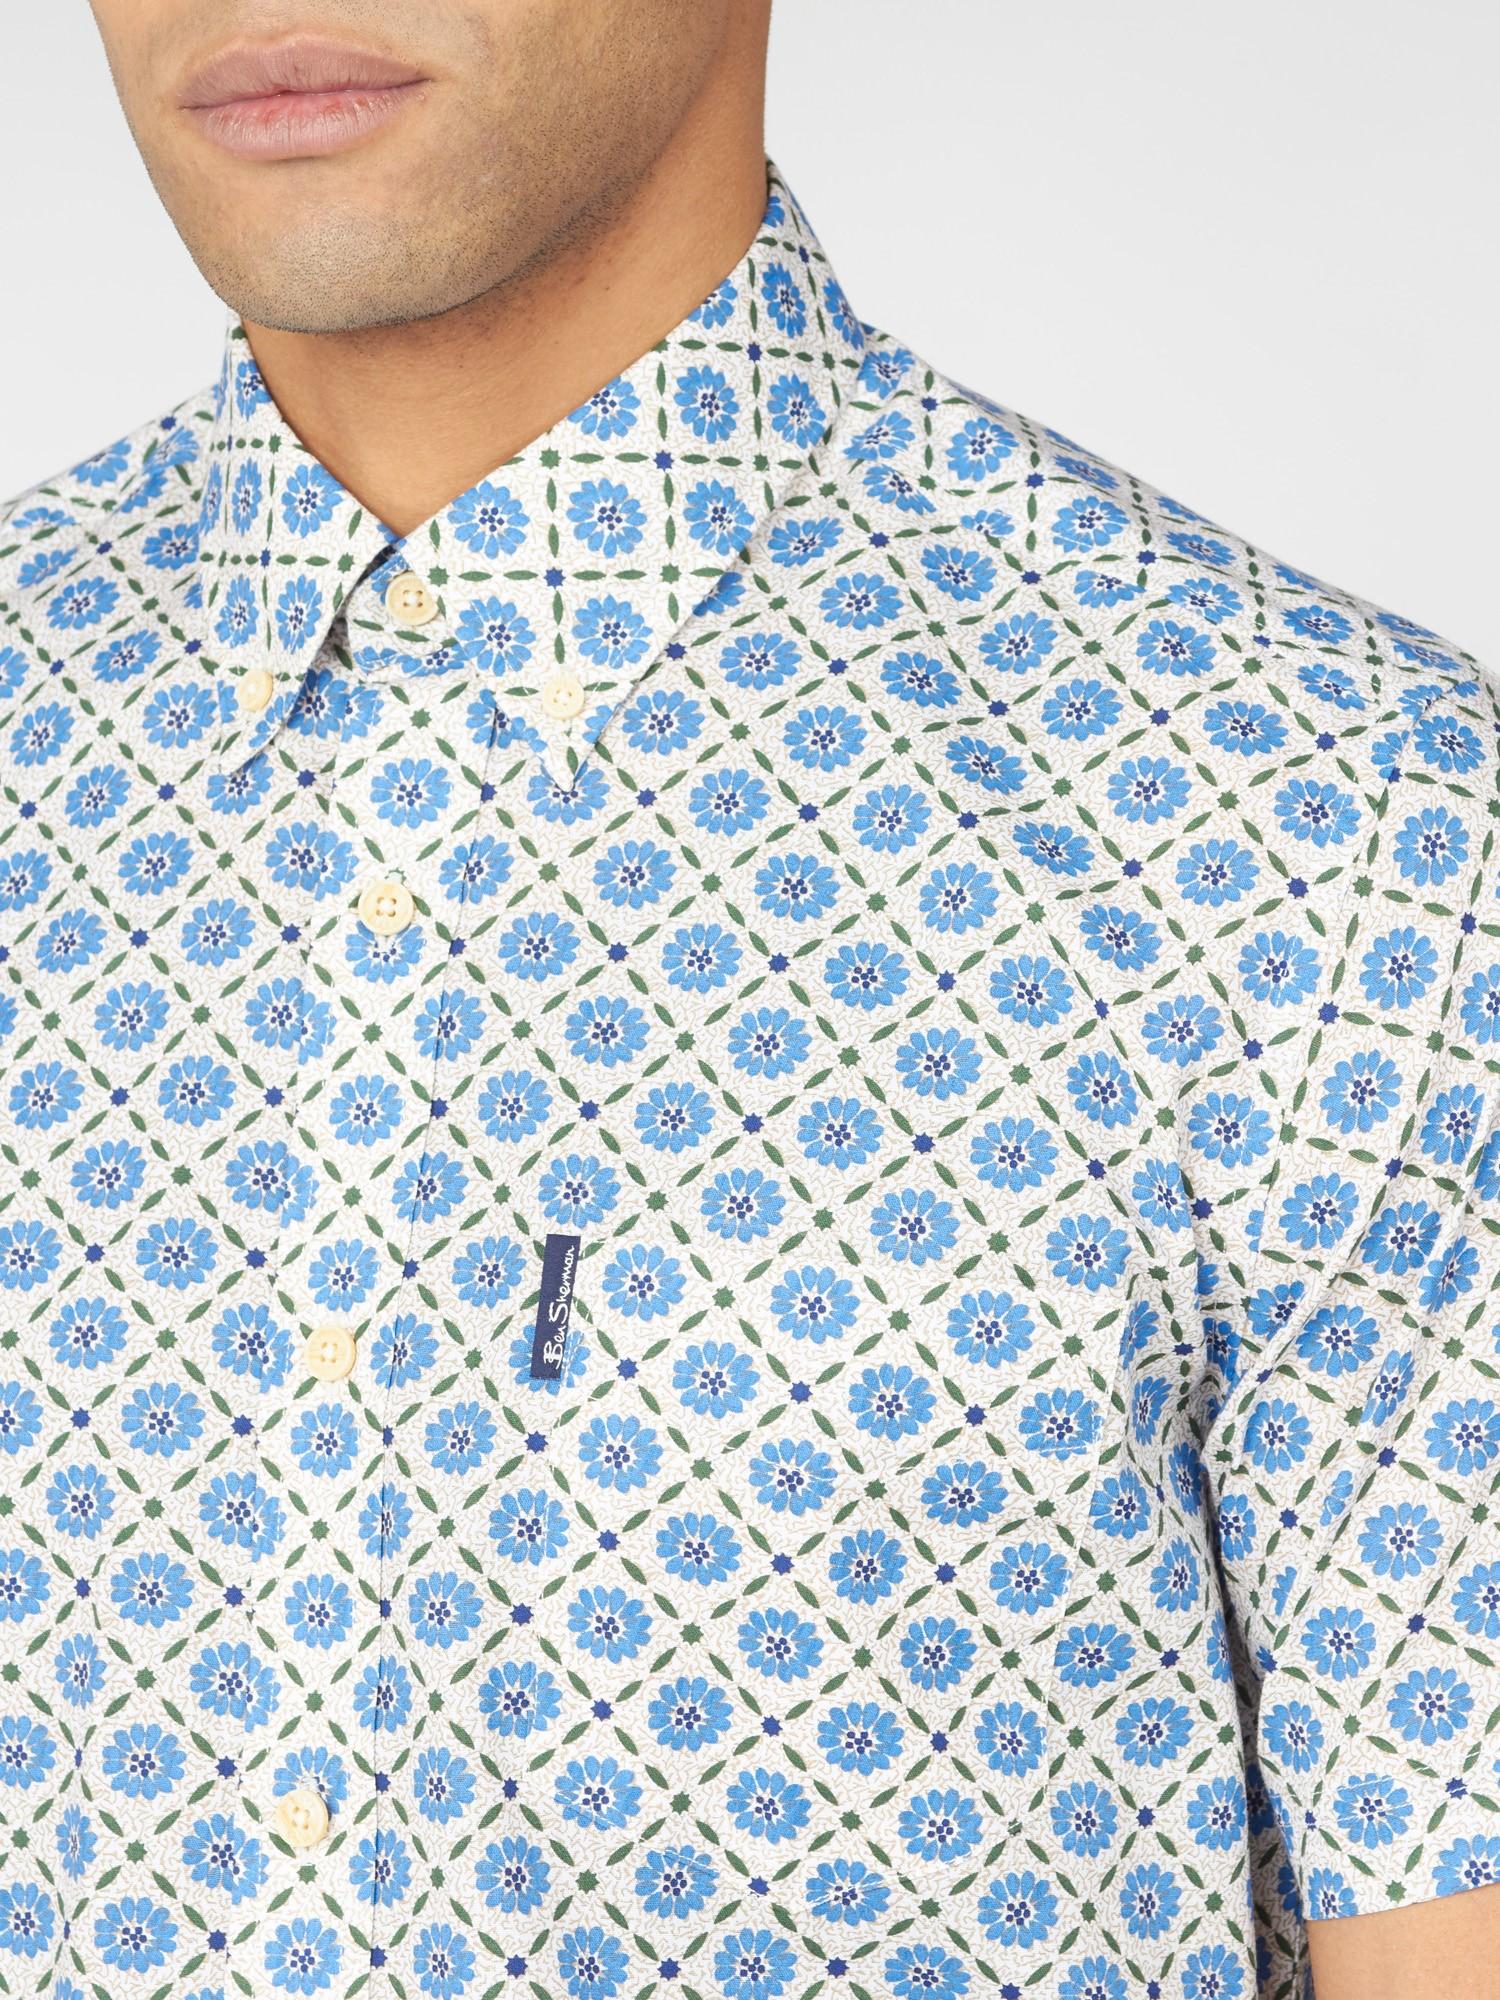 Block Floral Short Sleeve Shirt